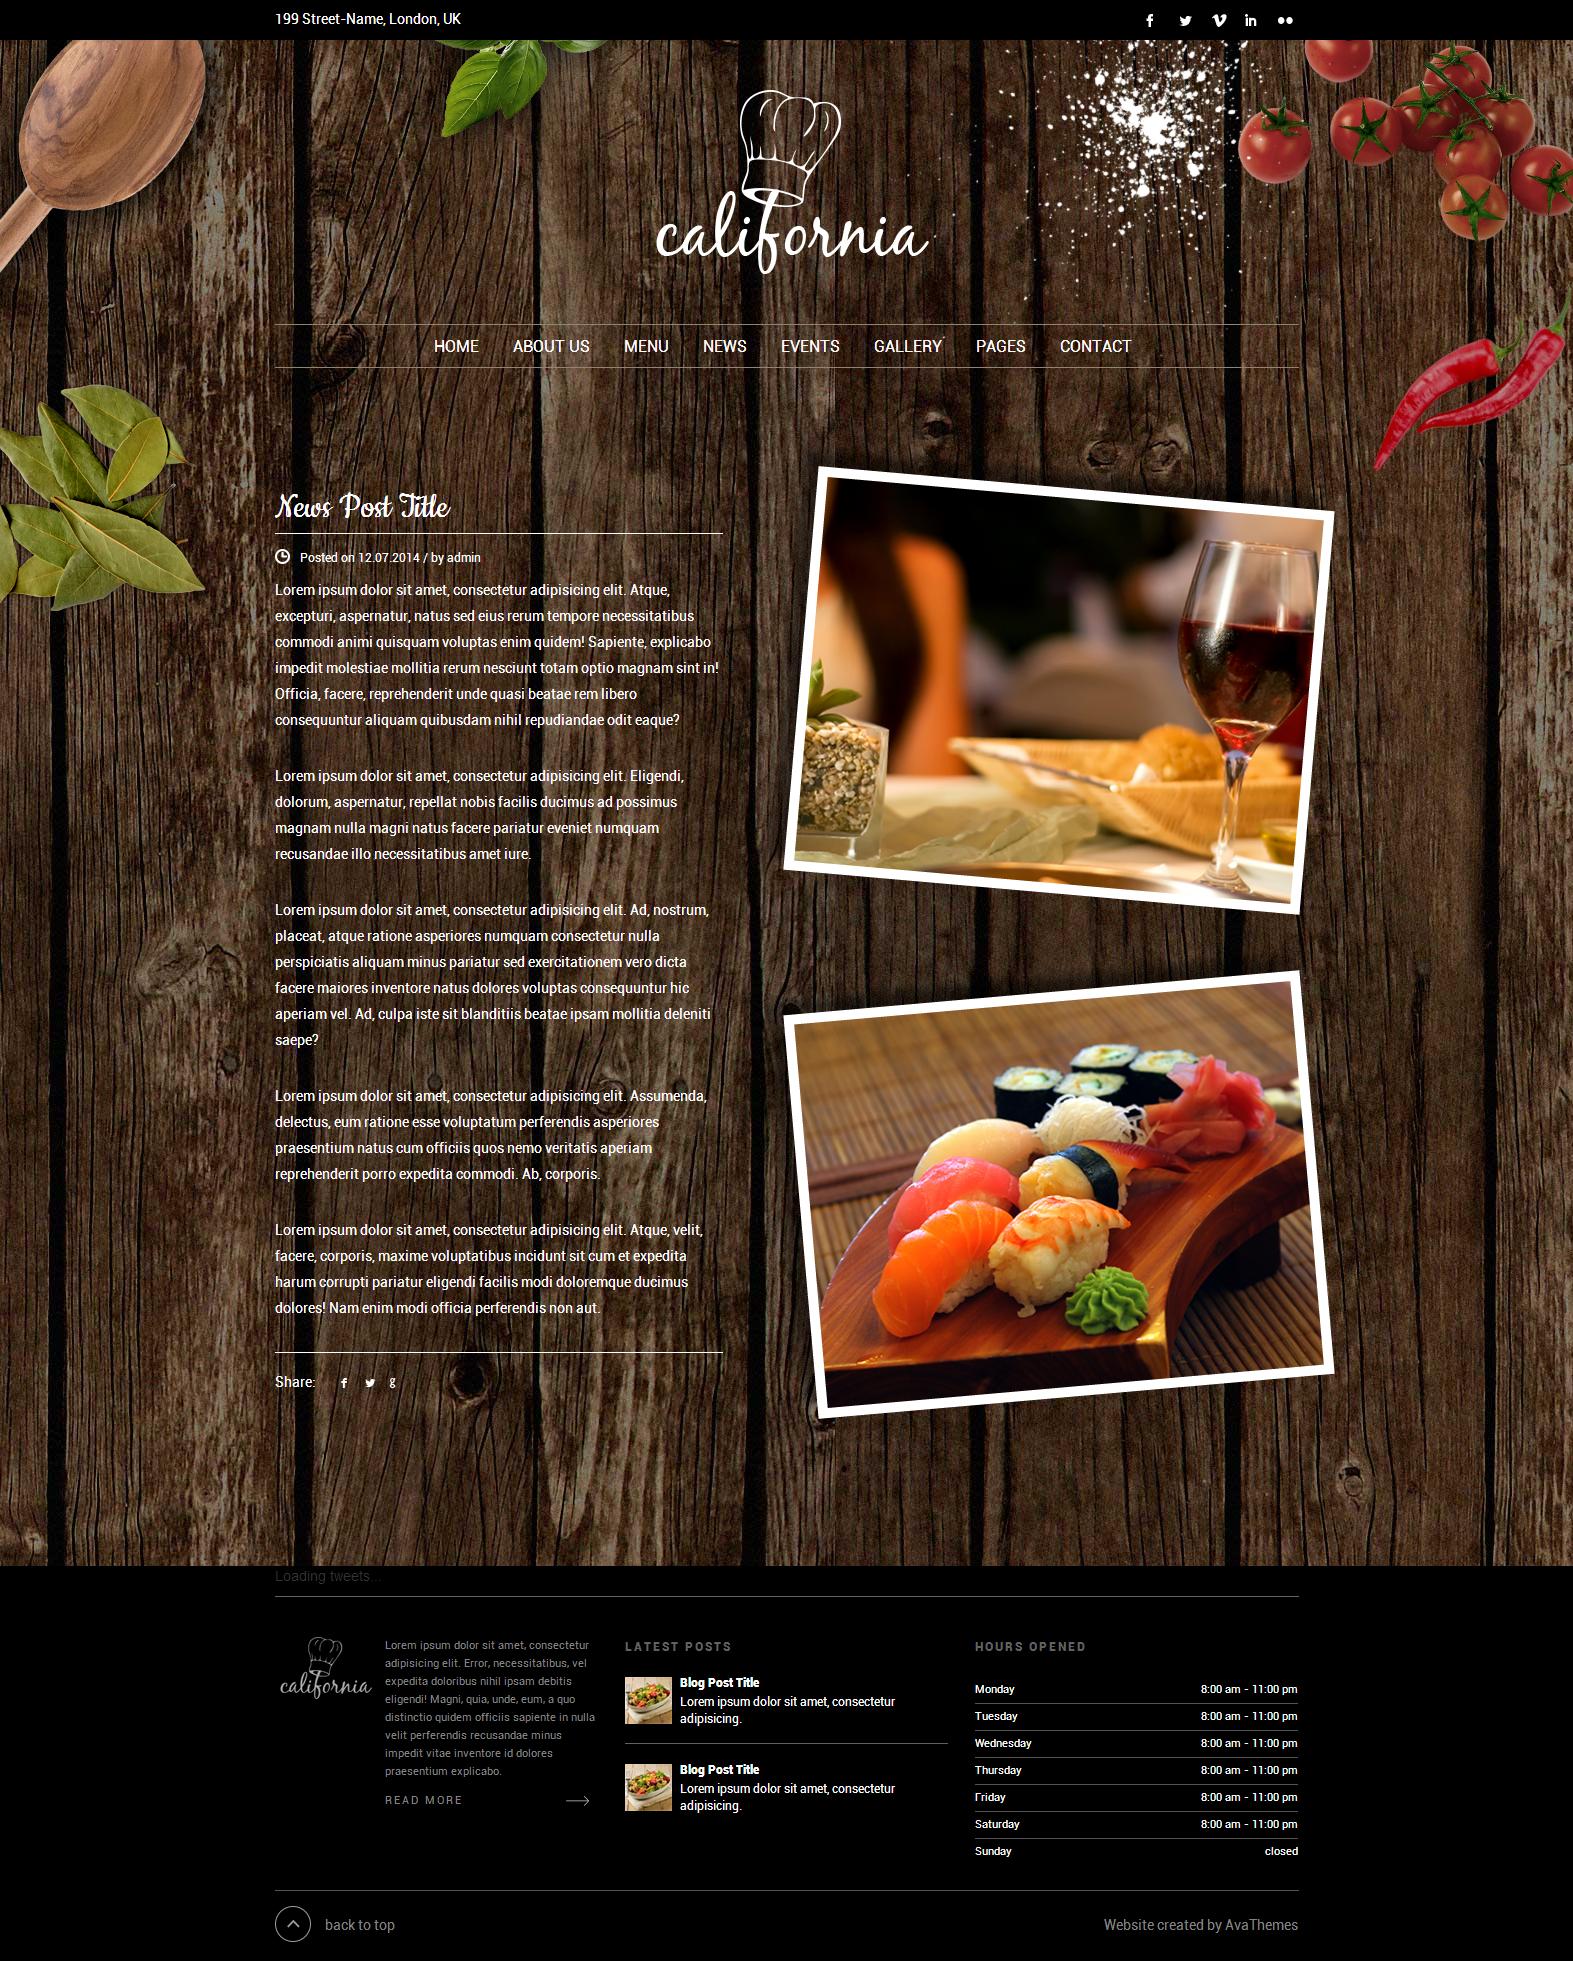 California - Restaurant Hotel Shop WordPress Theme